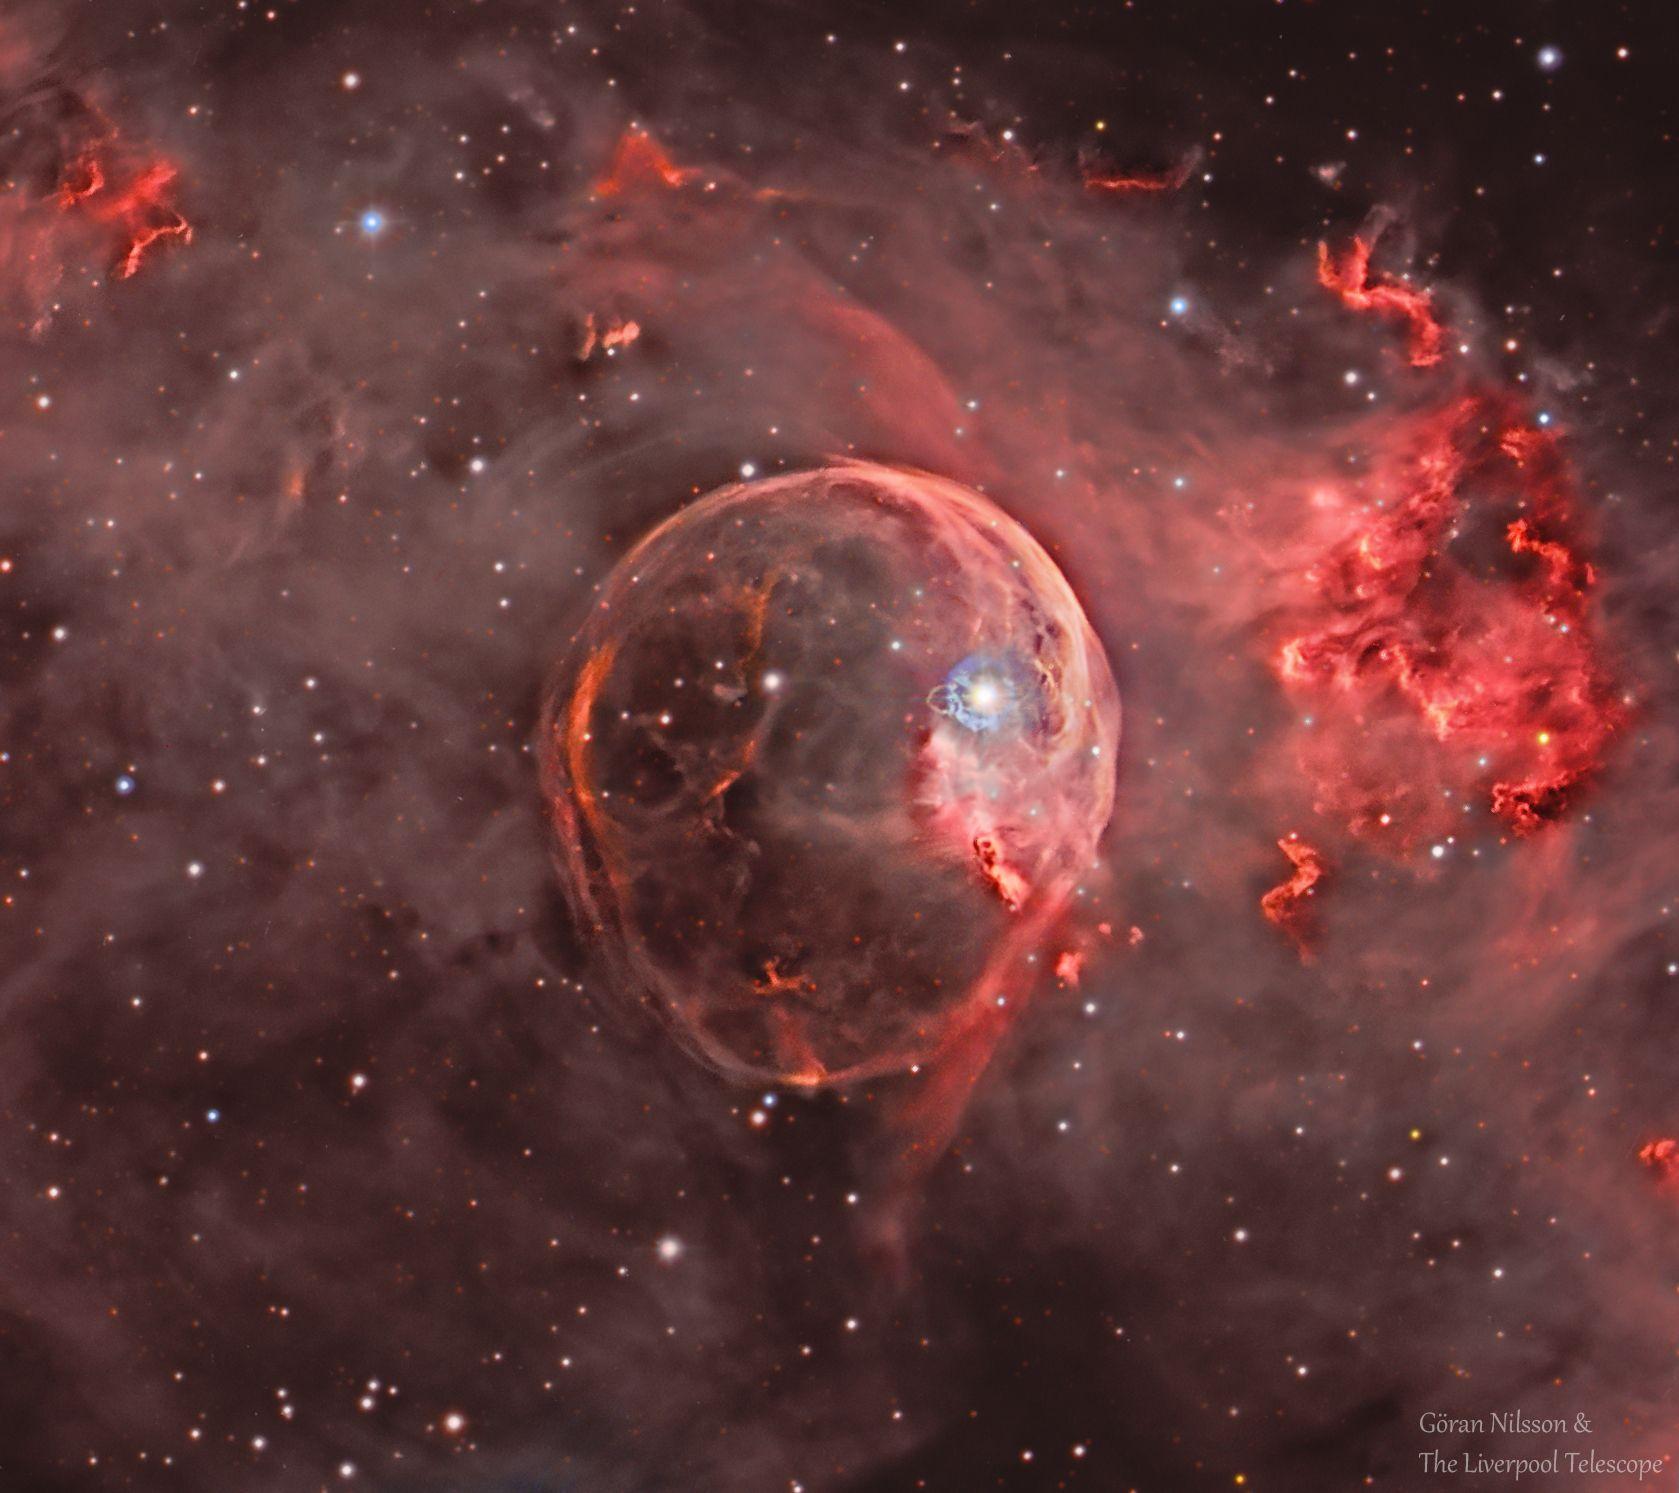 NGC 7635: The Bubble Nebula Expanding